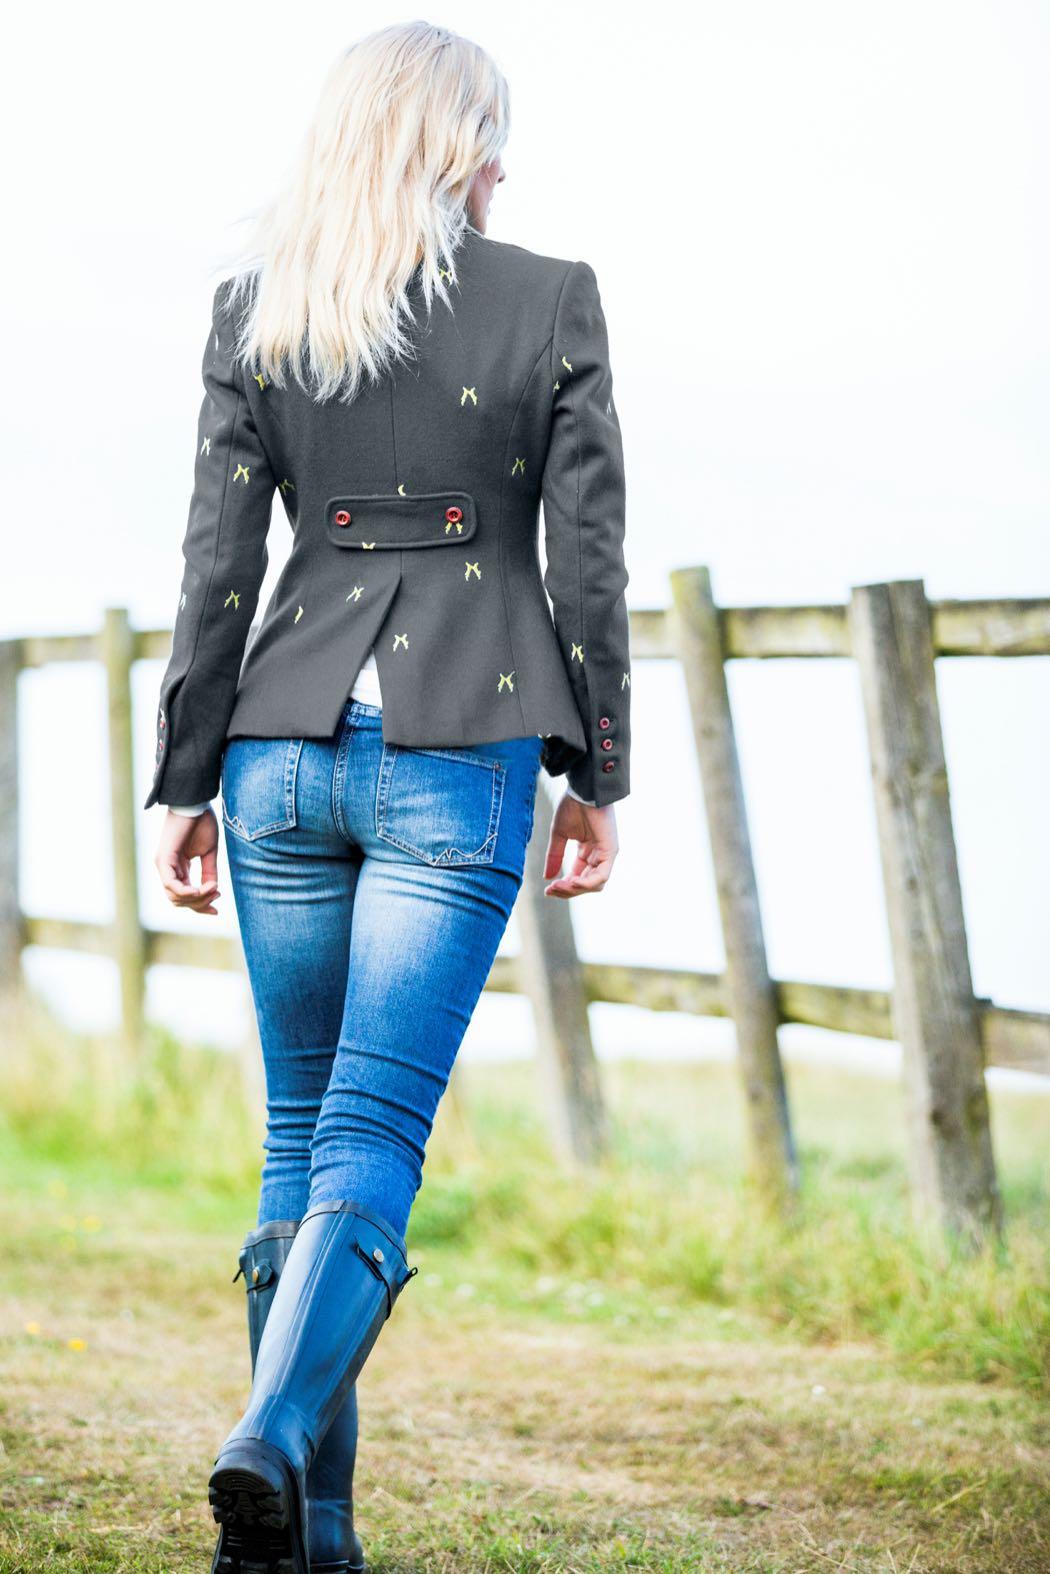 Sporting Hares – Fashionable British Countryside Bumpkins